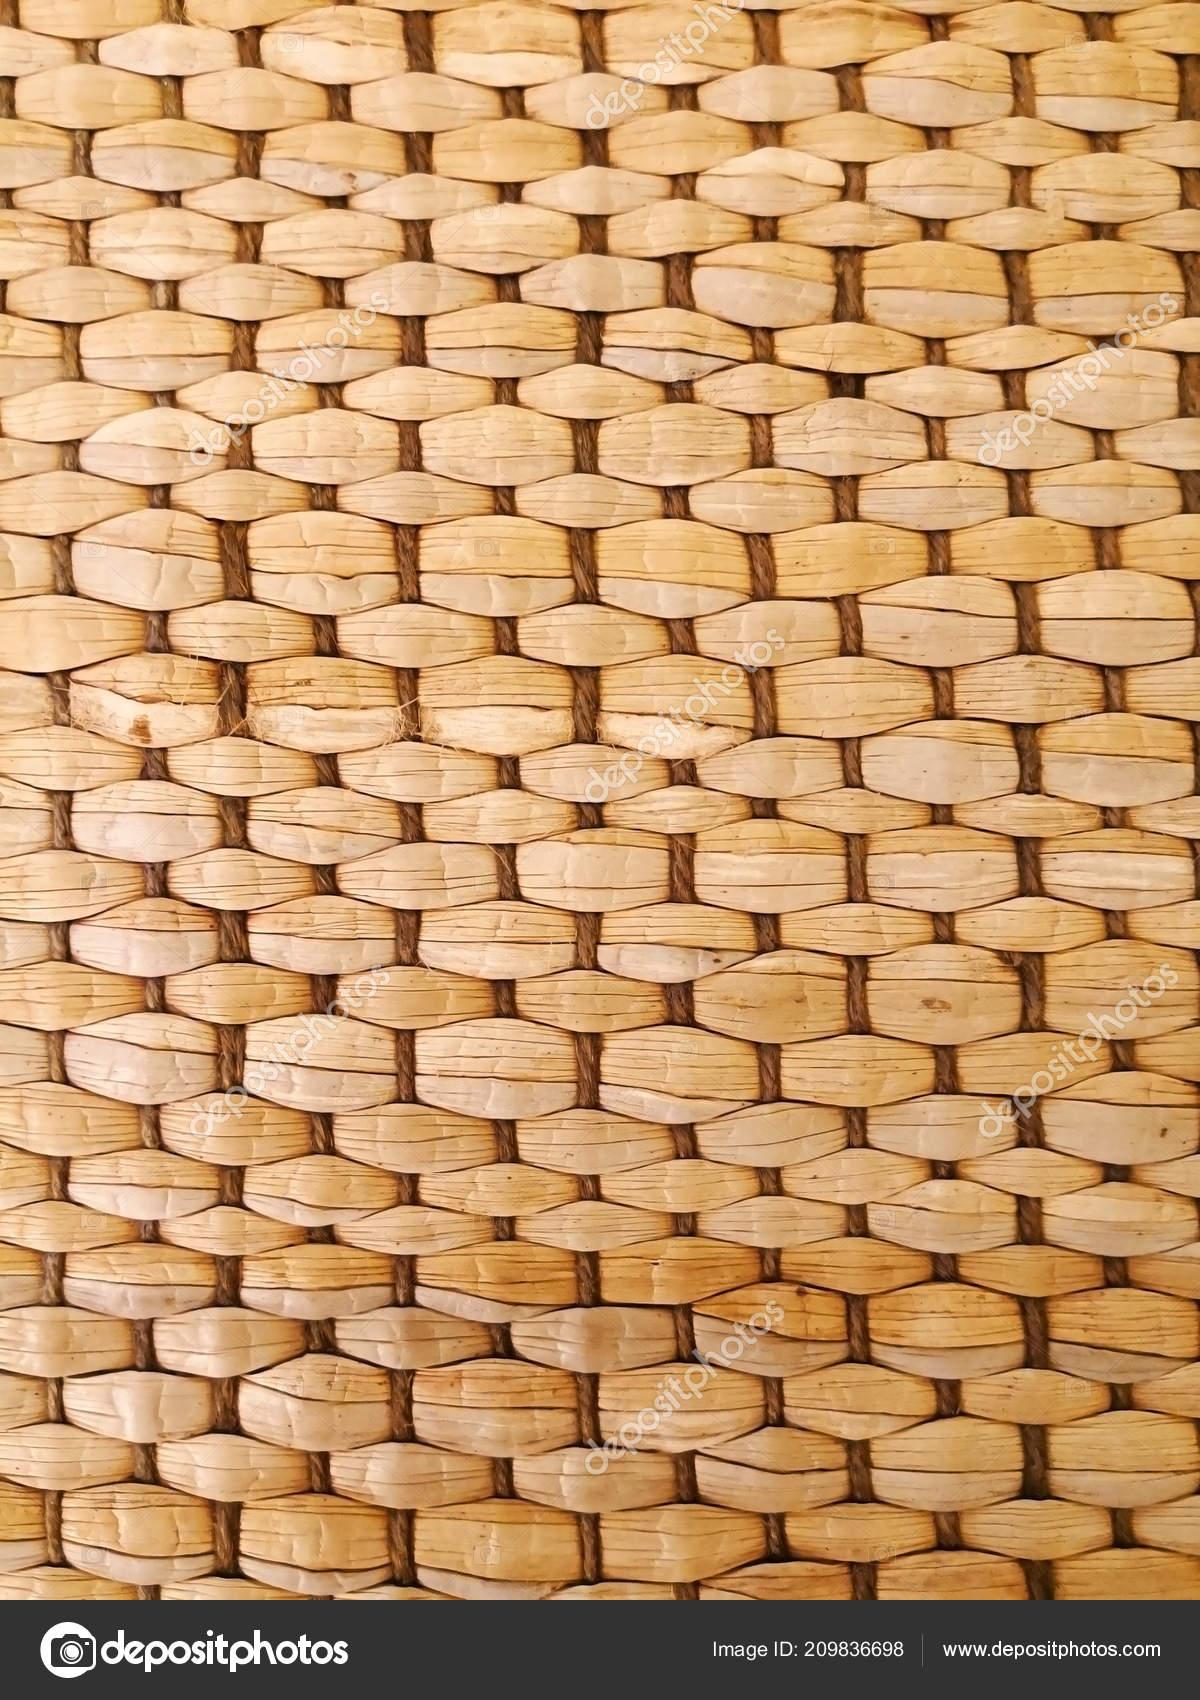 Abstract Background Made Dried Okra Woven Hemp Rope Closeup View Stock Photo C Rujirathumdumrong Gmail Com 209836698